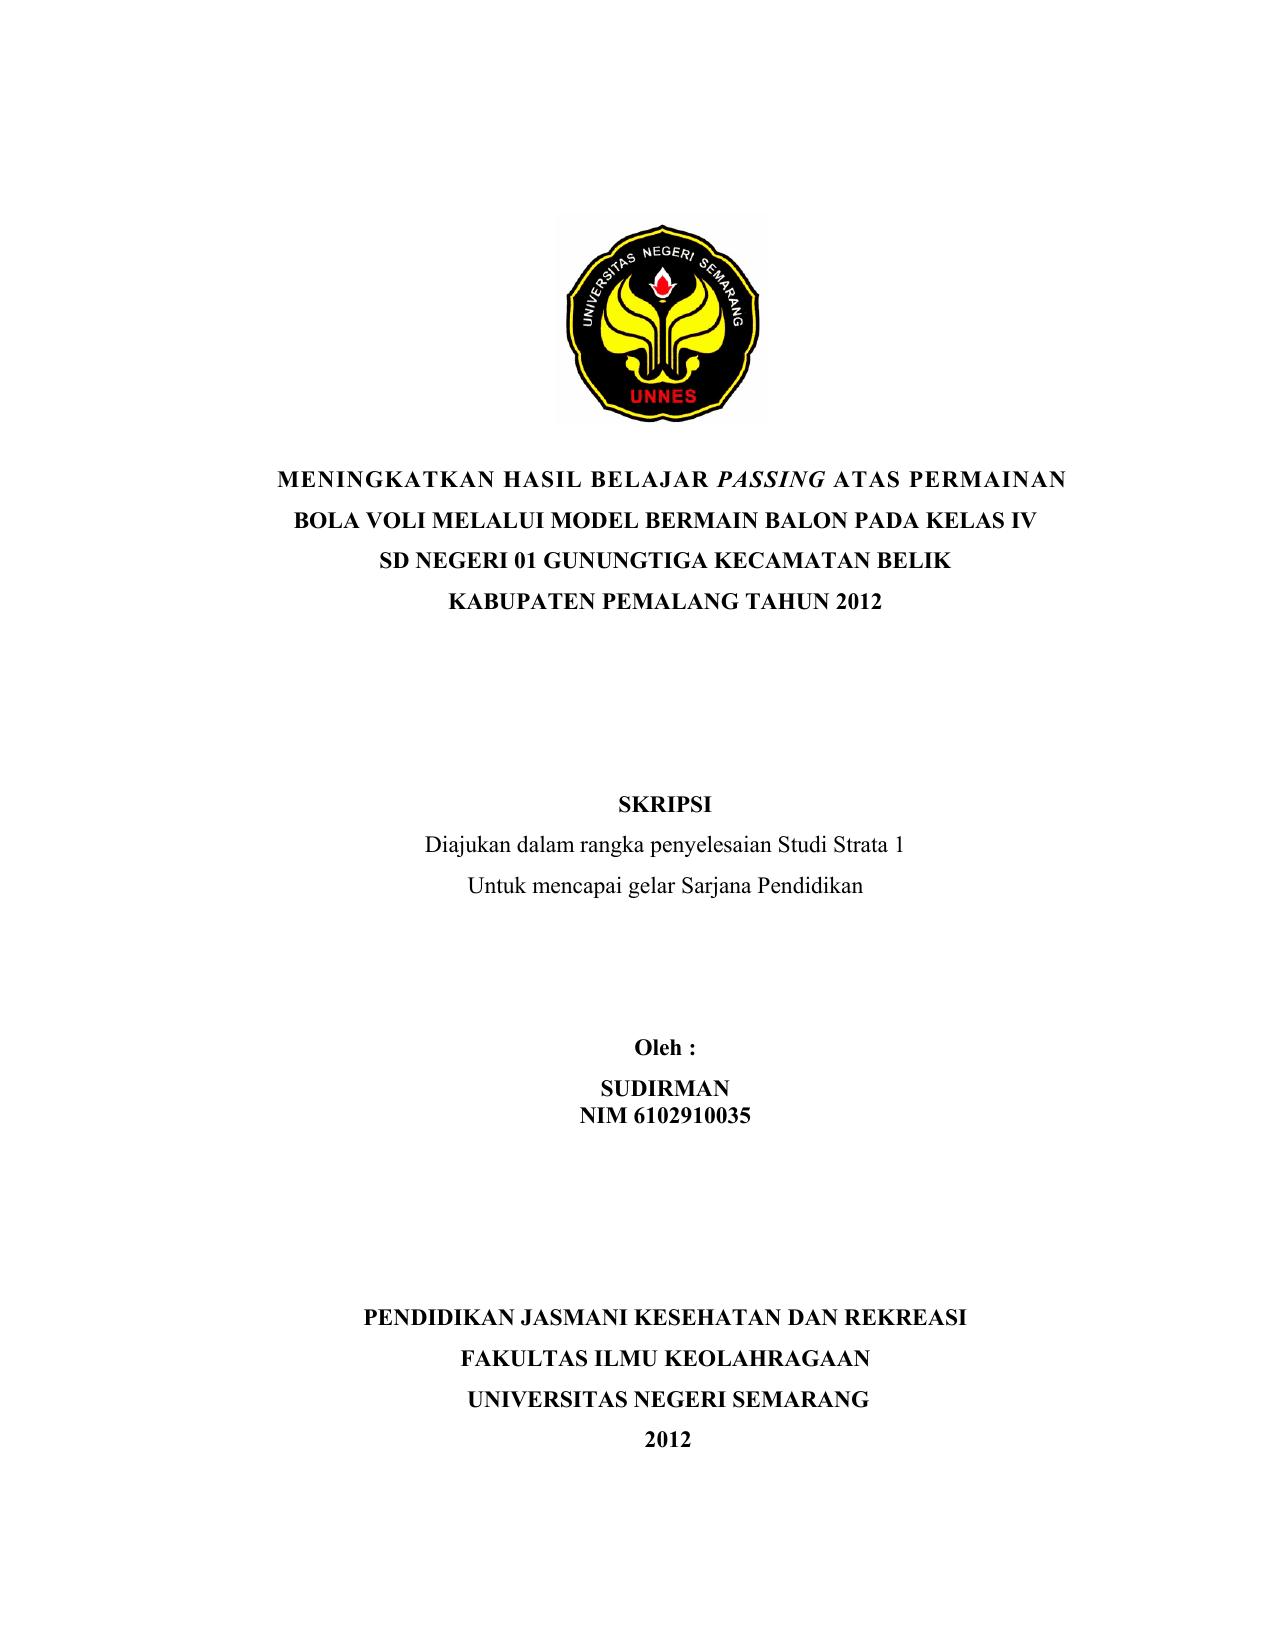 Contoh Proposal Penelitian Olahraga Bola Voli Berbagi Contoh Proposal